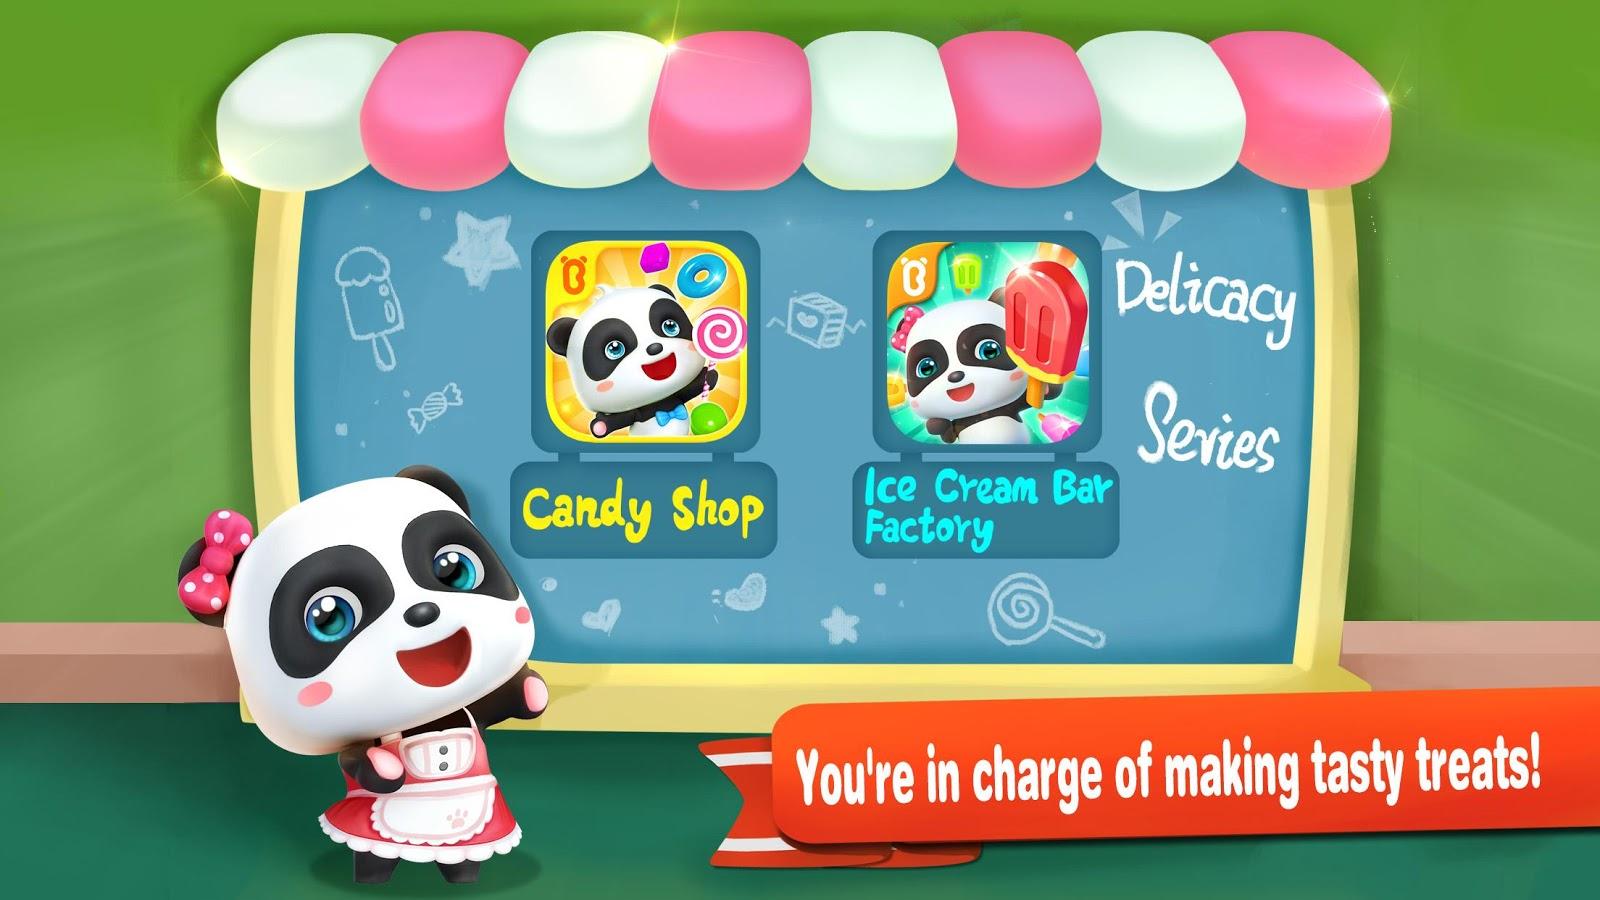 Little Pandas Ice Cream Factory 8290000 Apk Download Android Mainan Anak Frozen Maker Pembuat Screenshot 10